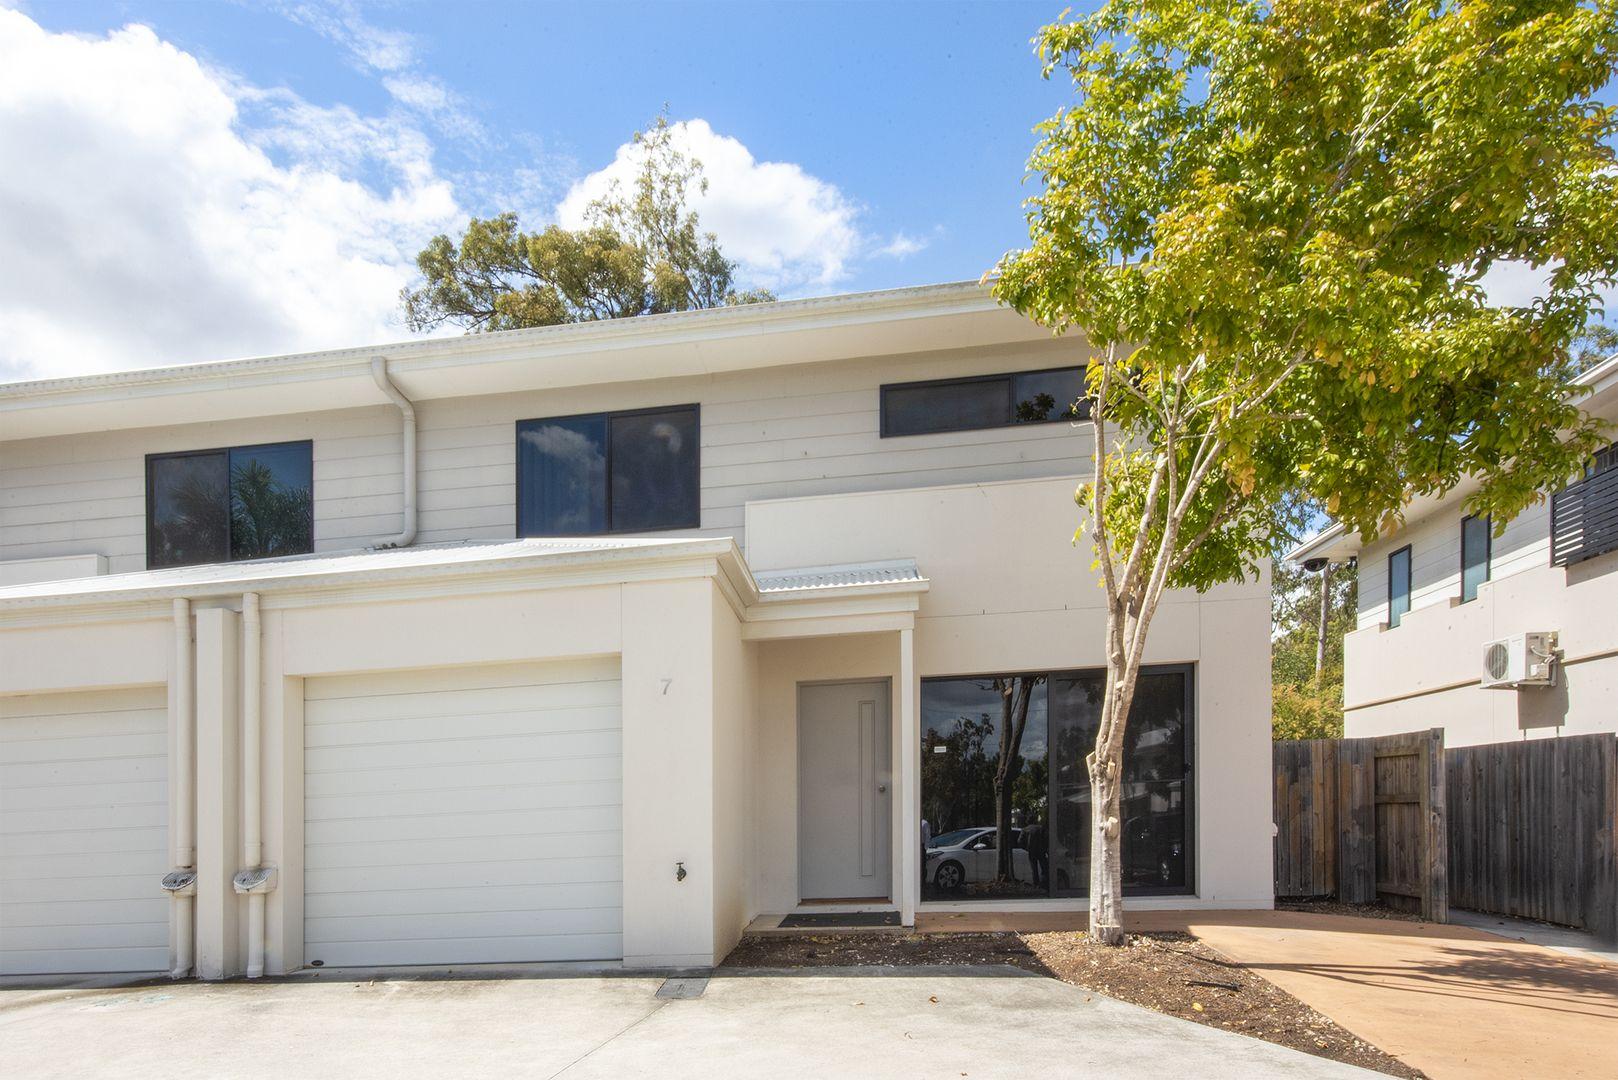 7/698-700 Kingston Road, Loganlea QLD 4131, Image 0